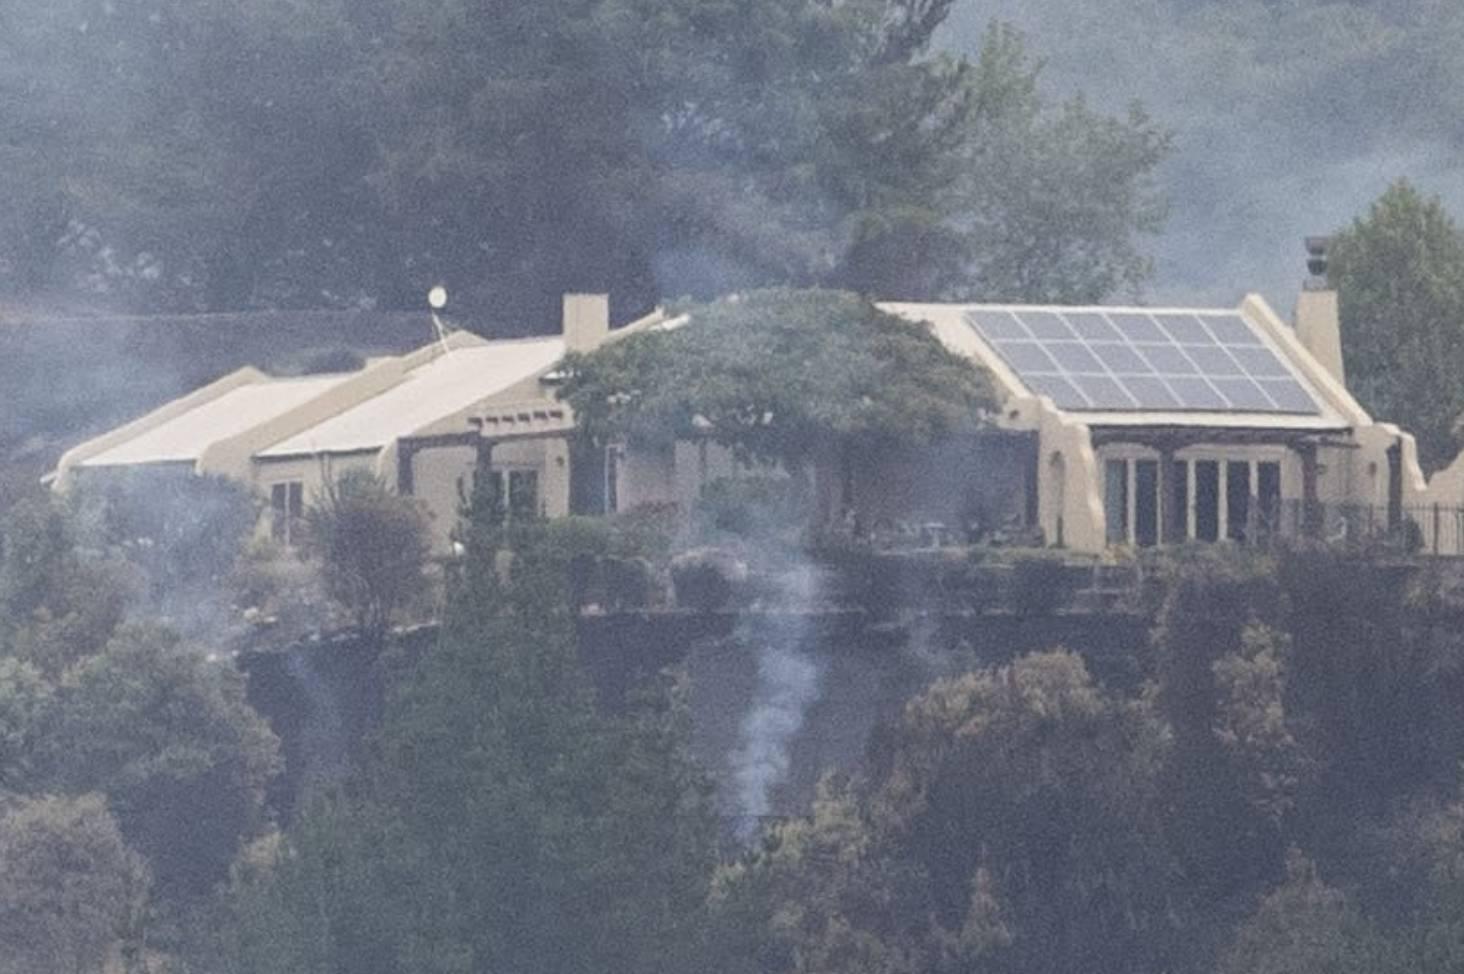 Nelson bush fire: New blaze as crews fight 'horrendous' wildfire